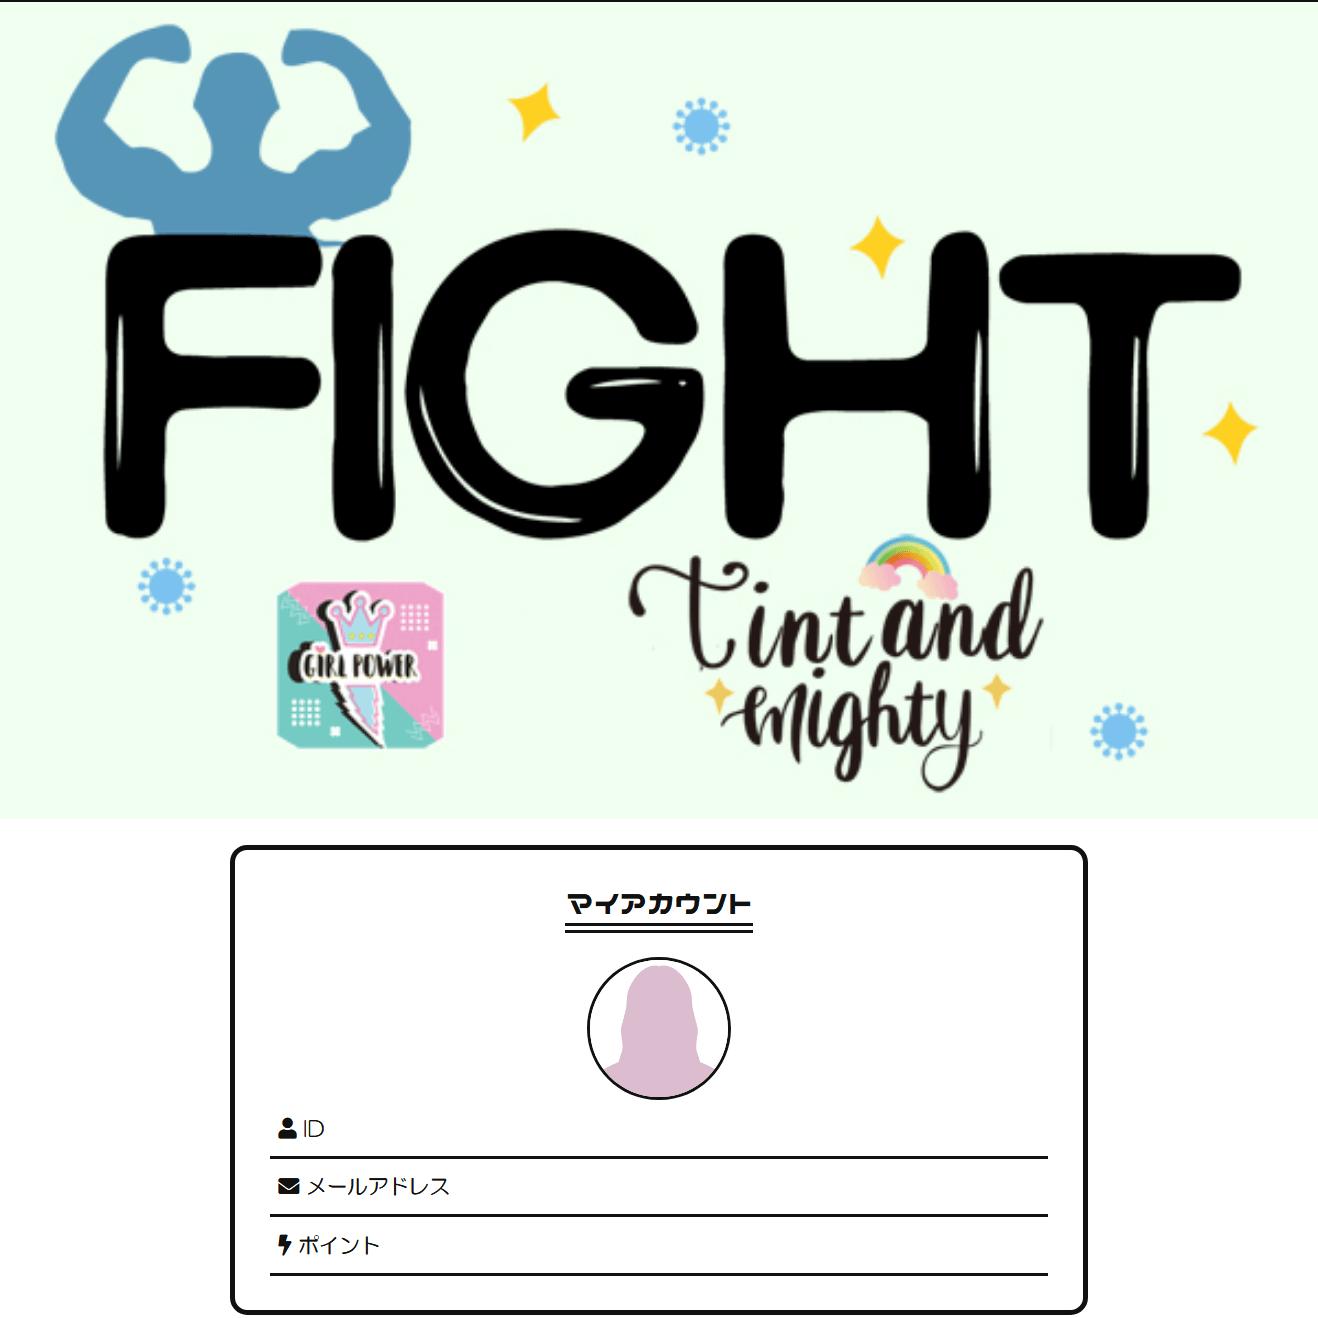 【cancan・FIGHT】の被害報告